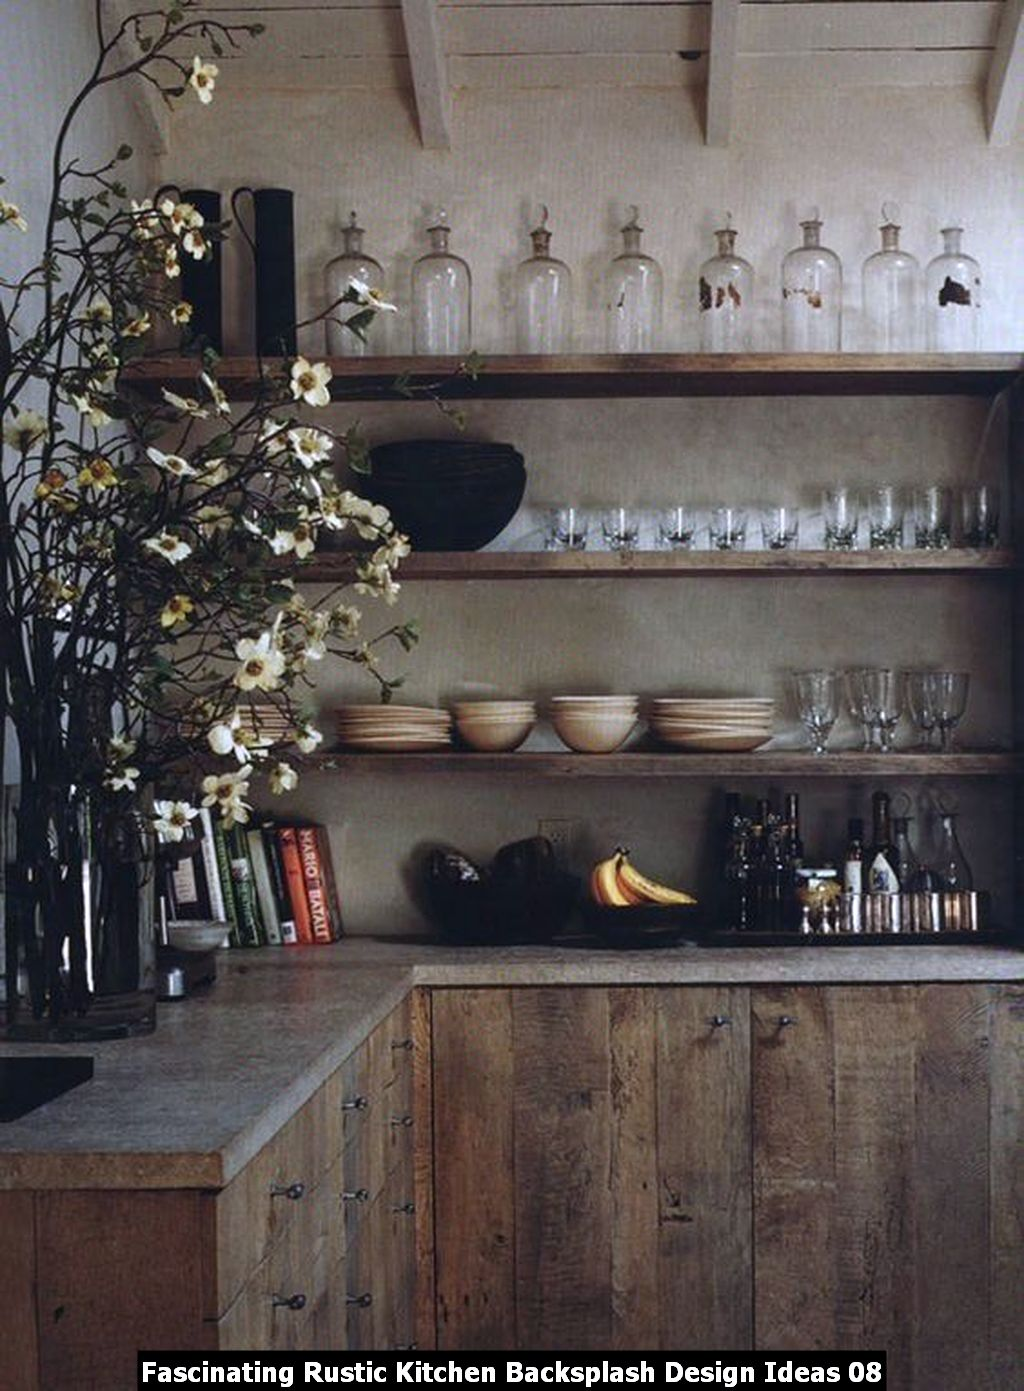 Fascinating Rustic Kitchen Backsplash Design Ideas 08